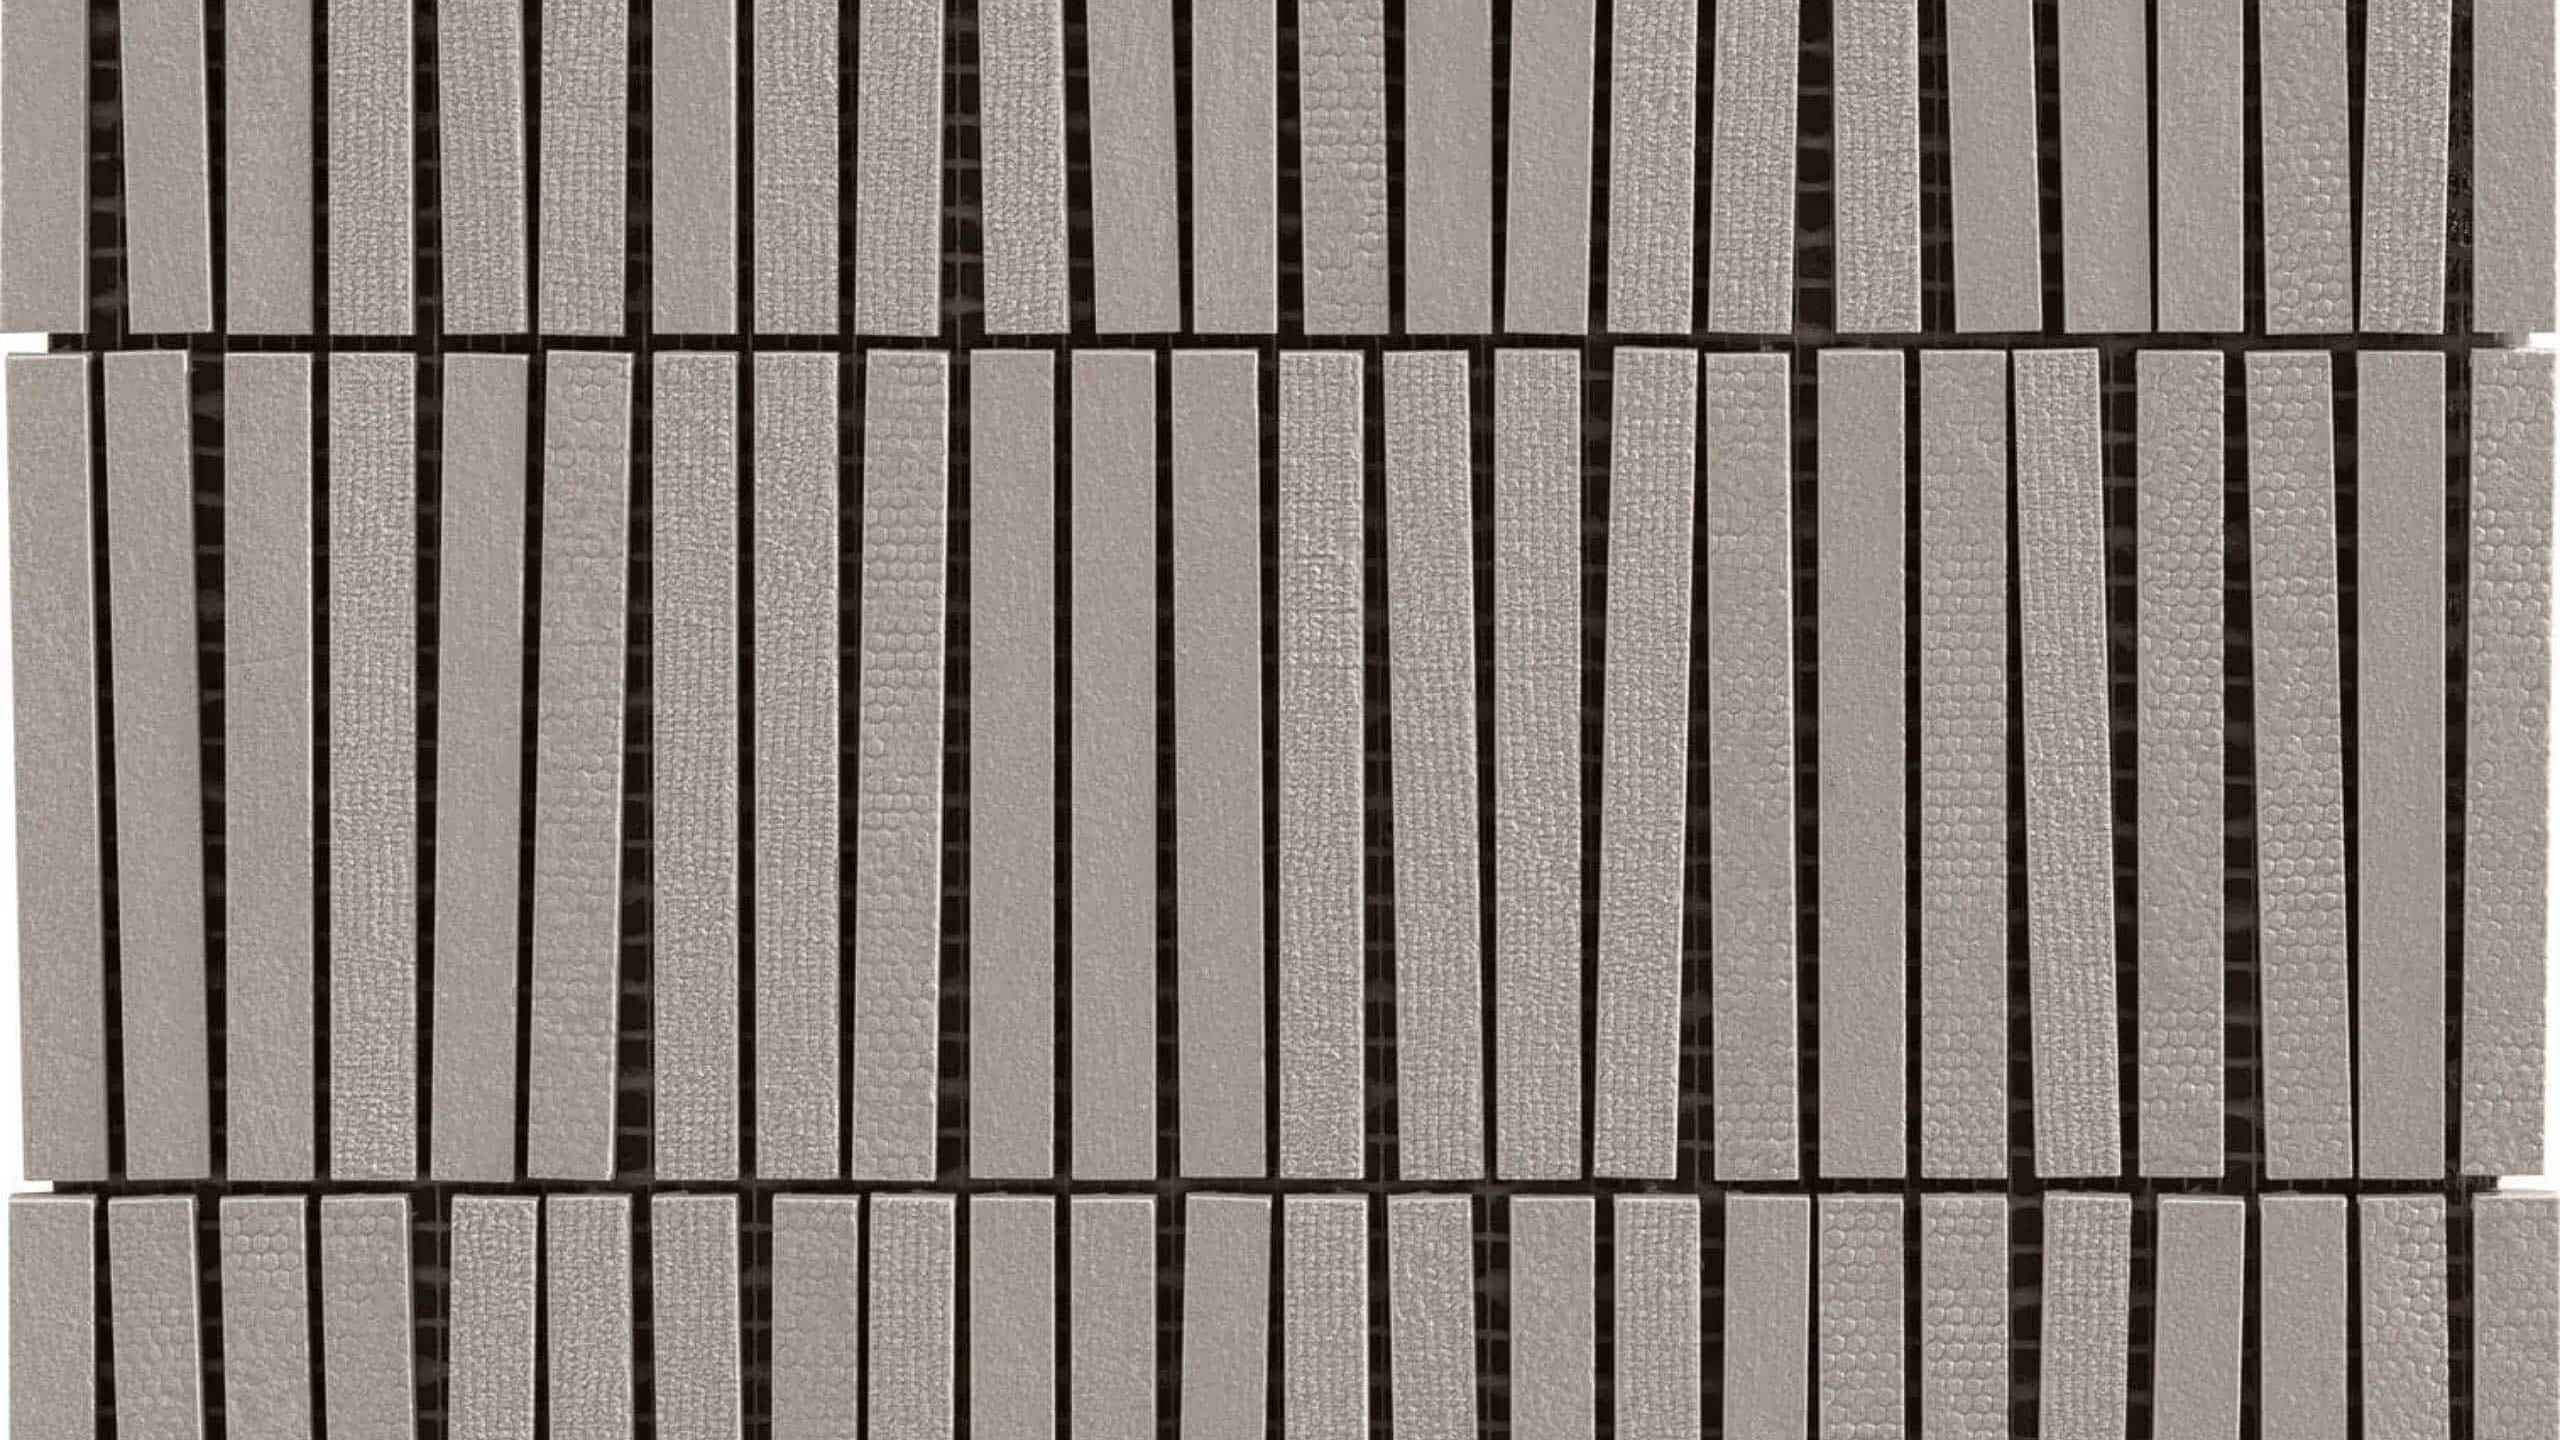 Sticks Clay Tiles